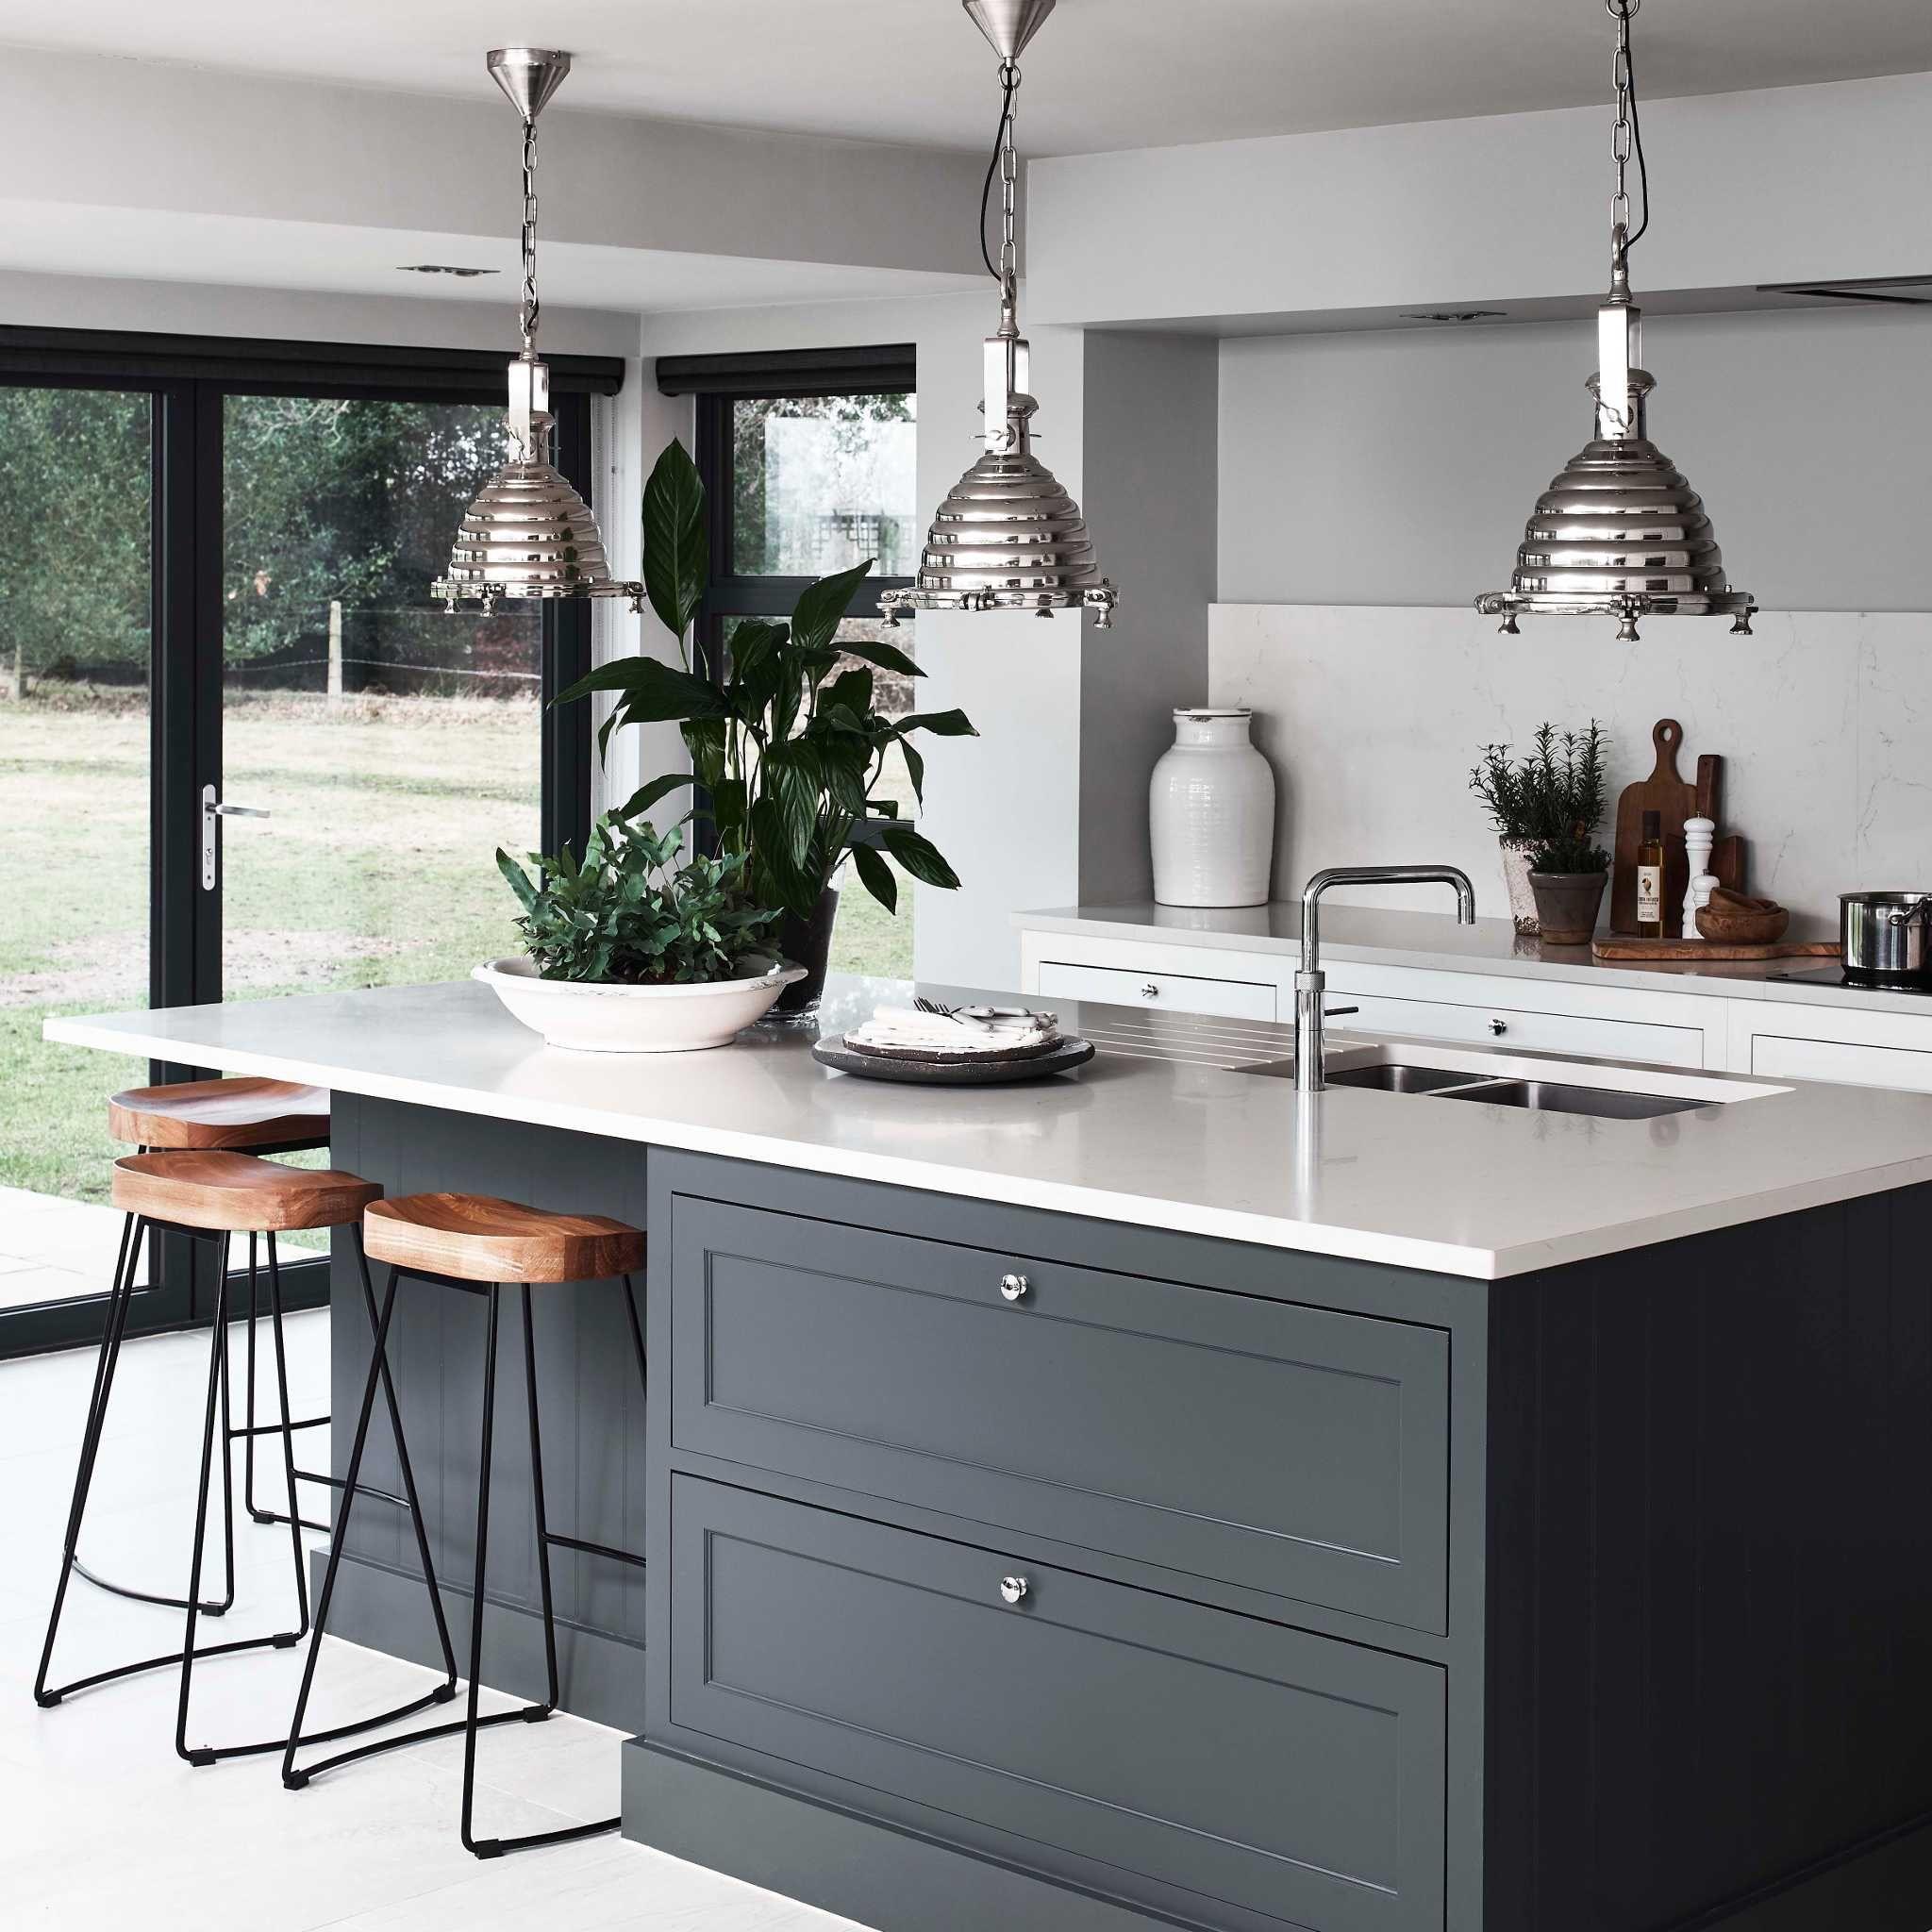 Pin By Lisa Wood Walker On Extension Pinterest Kitchens  # Muebles Estilo Pearce